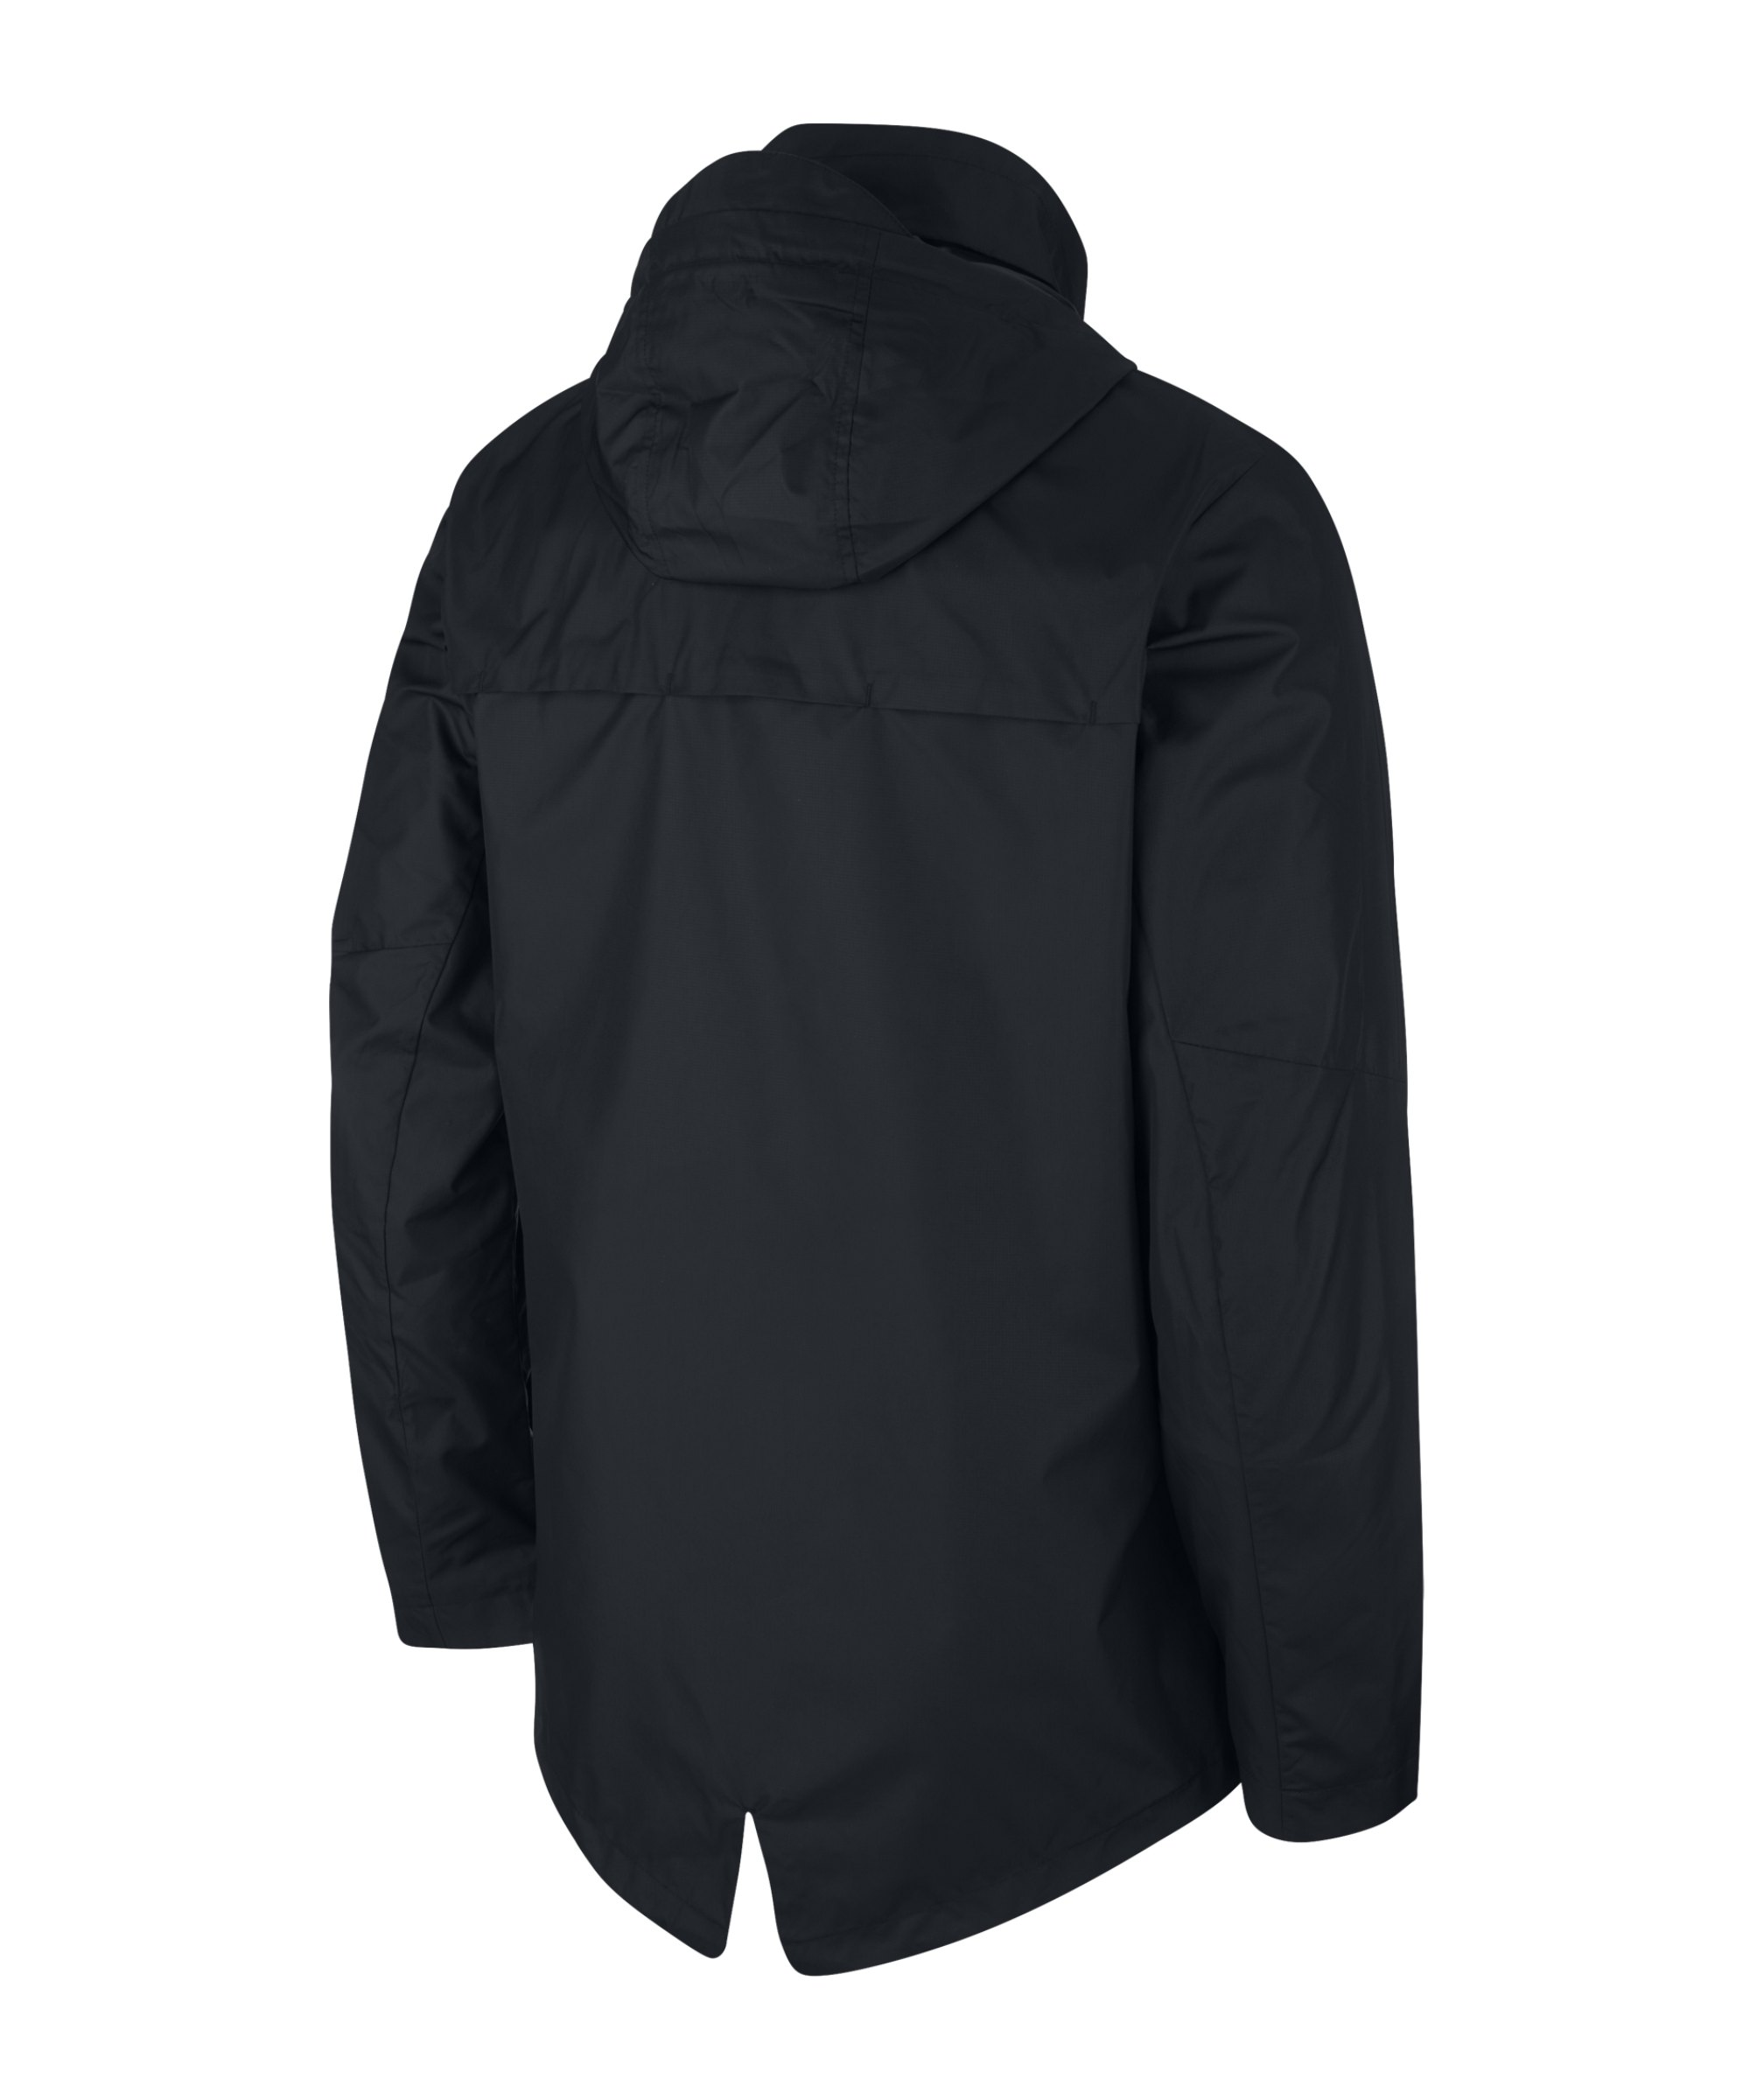 Nike Academy 18 Rain Jacket Regenjacke F010